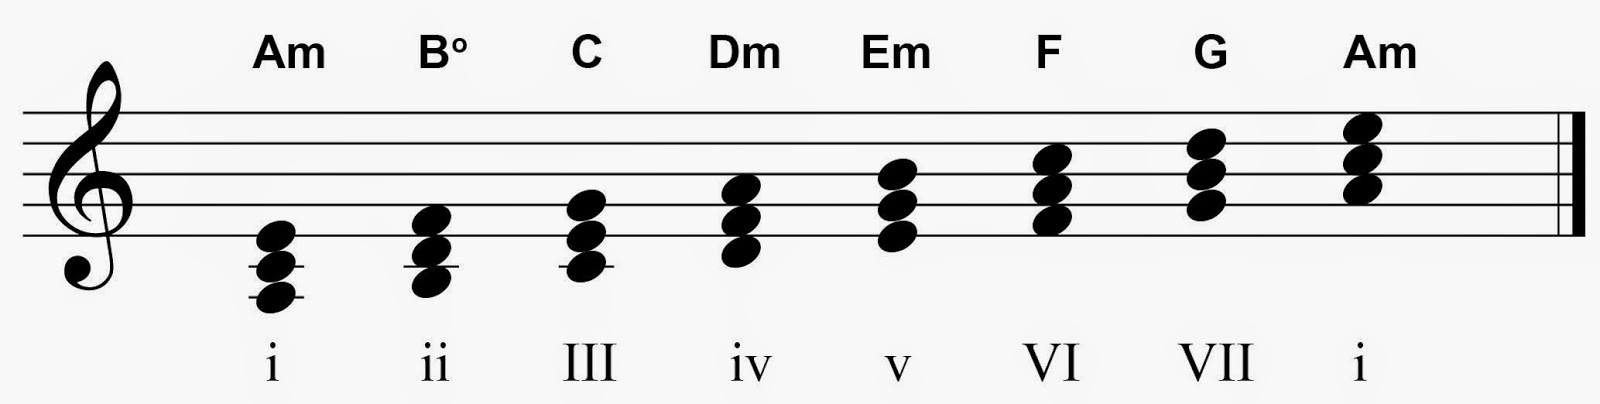 The Power Of The Six Chord In Minor Keys Creative Guitar Studio